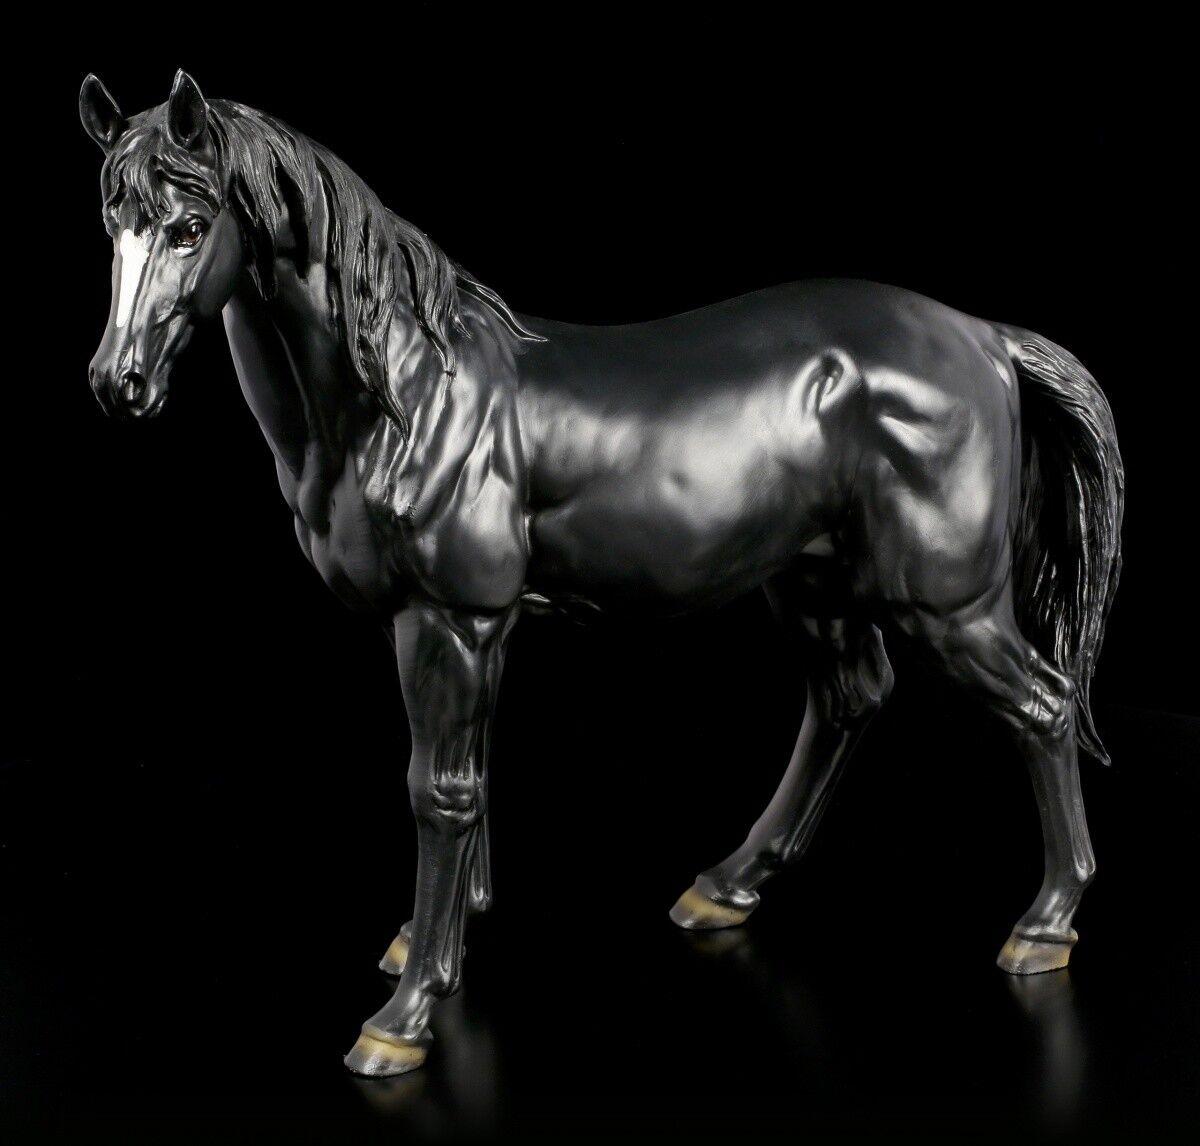 Grande nero Caballos - Figura Pferdestatue Semental Potro